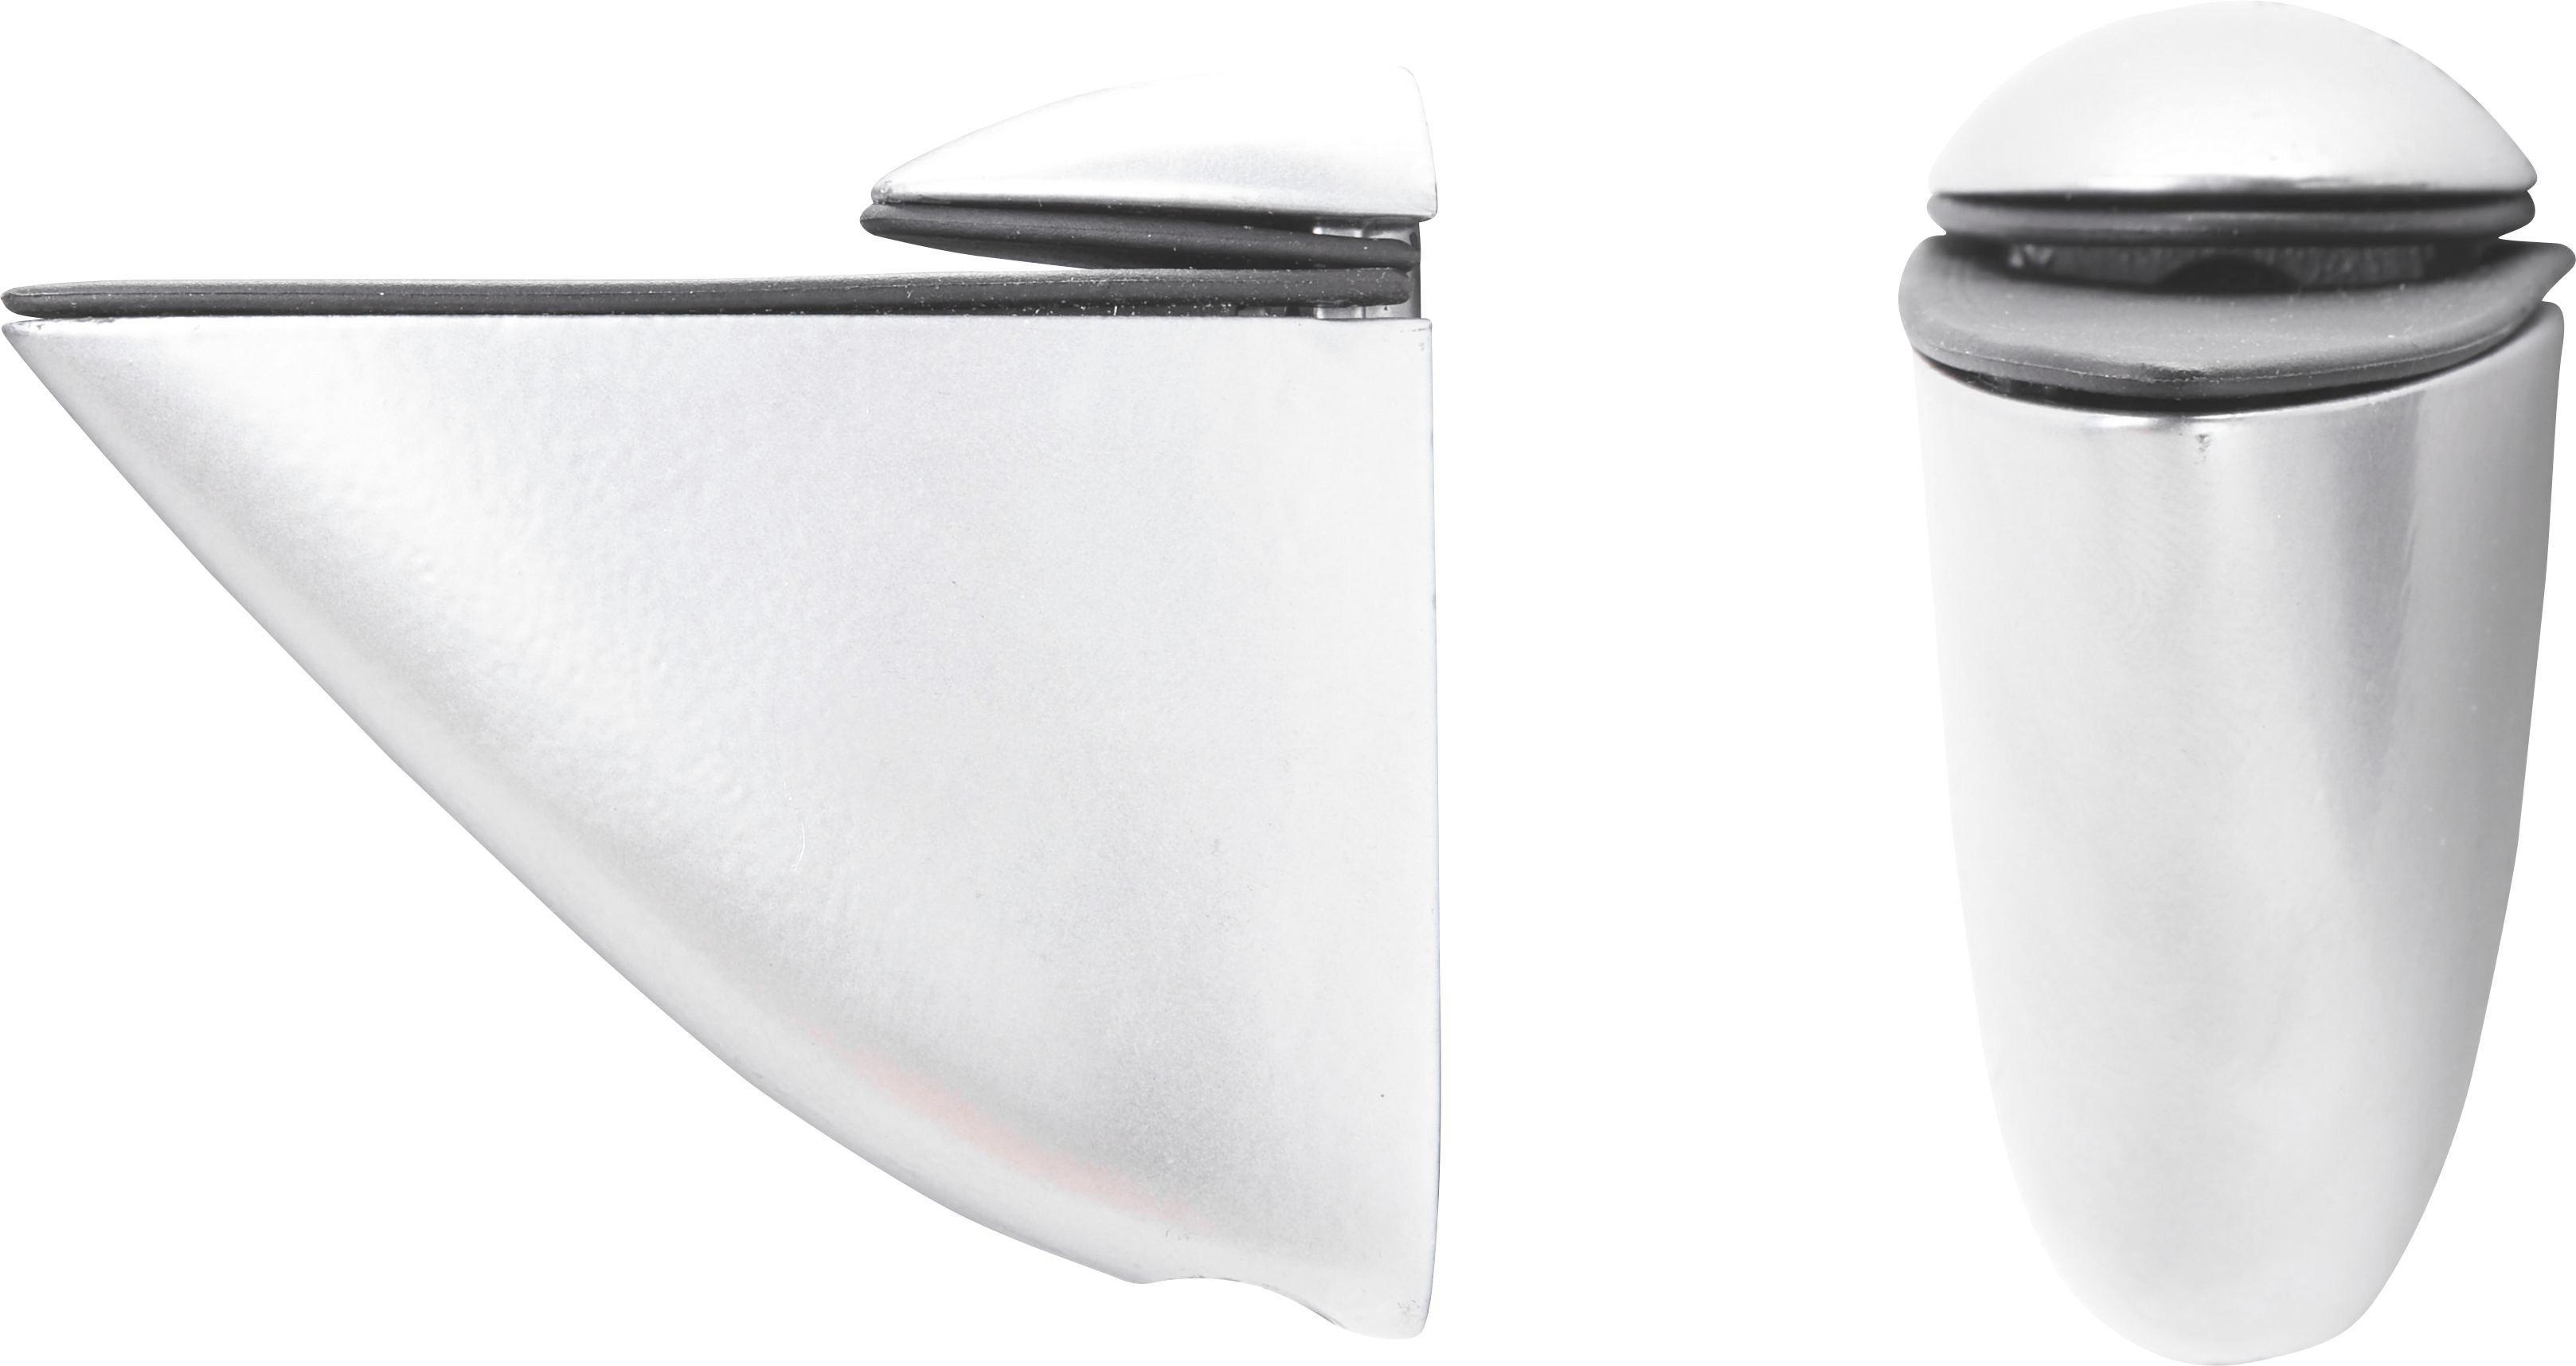 Wandhalter X-tra - Silberfarben, Basics, Metall (8/6cm) - MÖMAX modern living